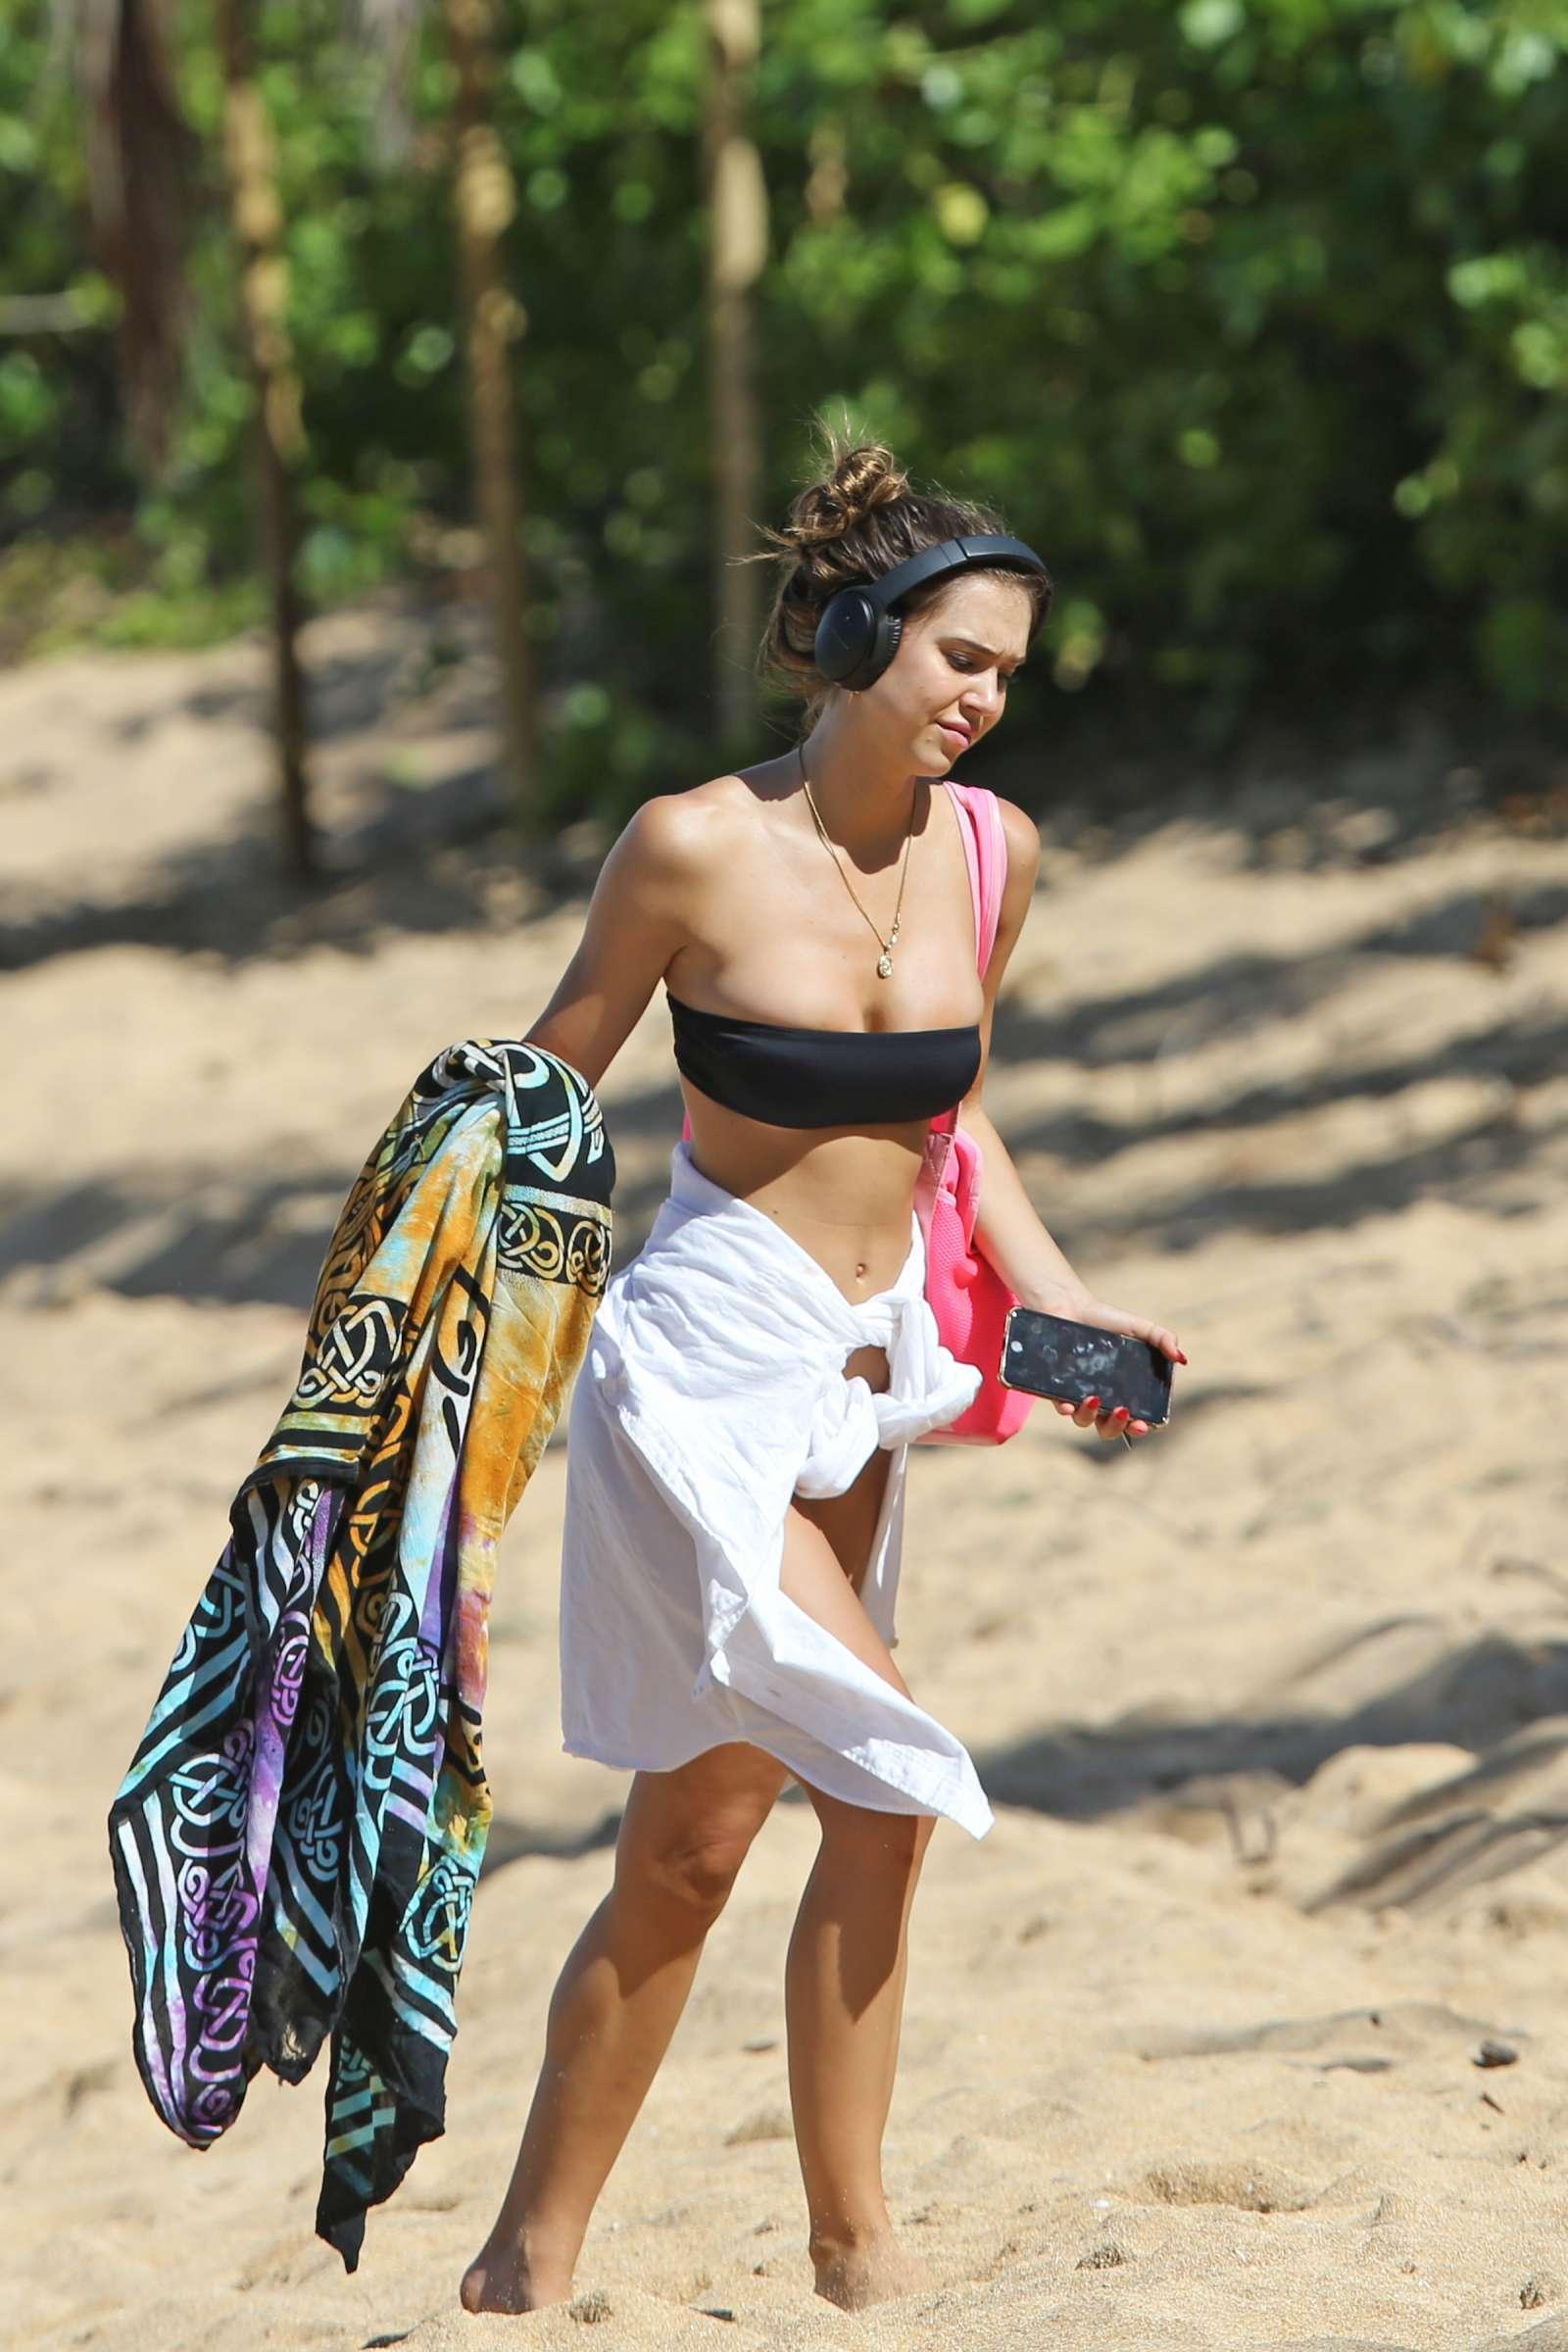 Alexis Ren in Bikini at a beach in Hawaii | Indian Girls ...